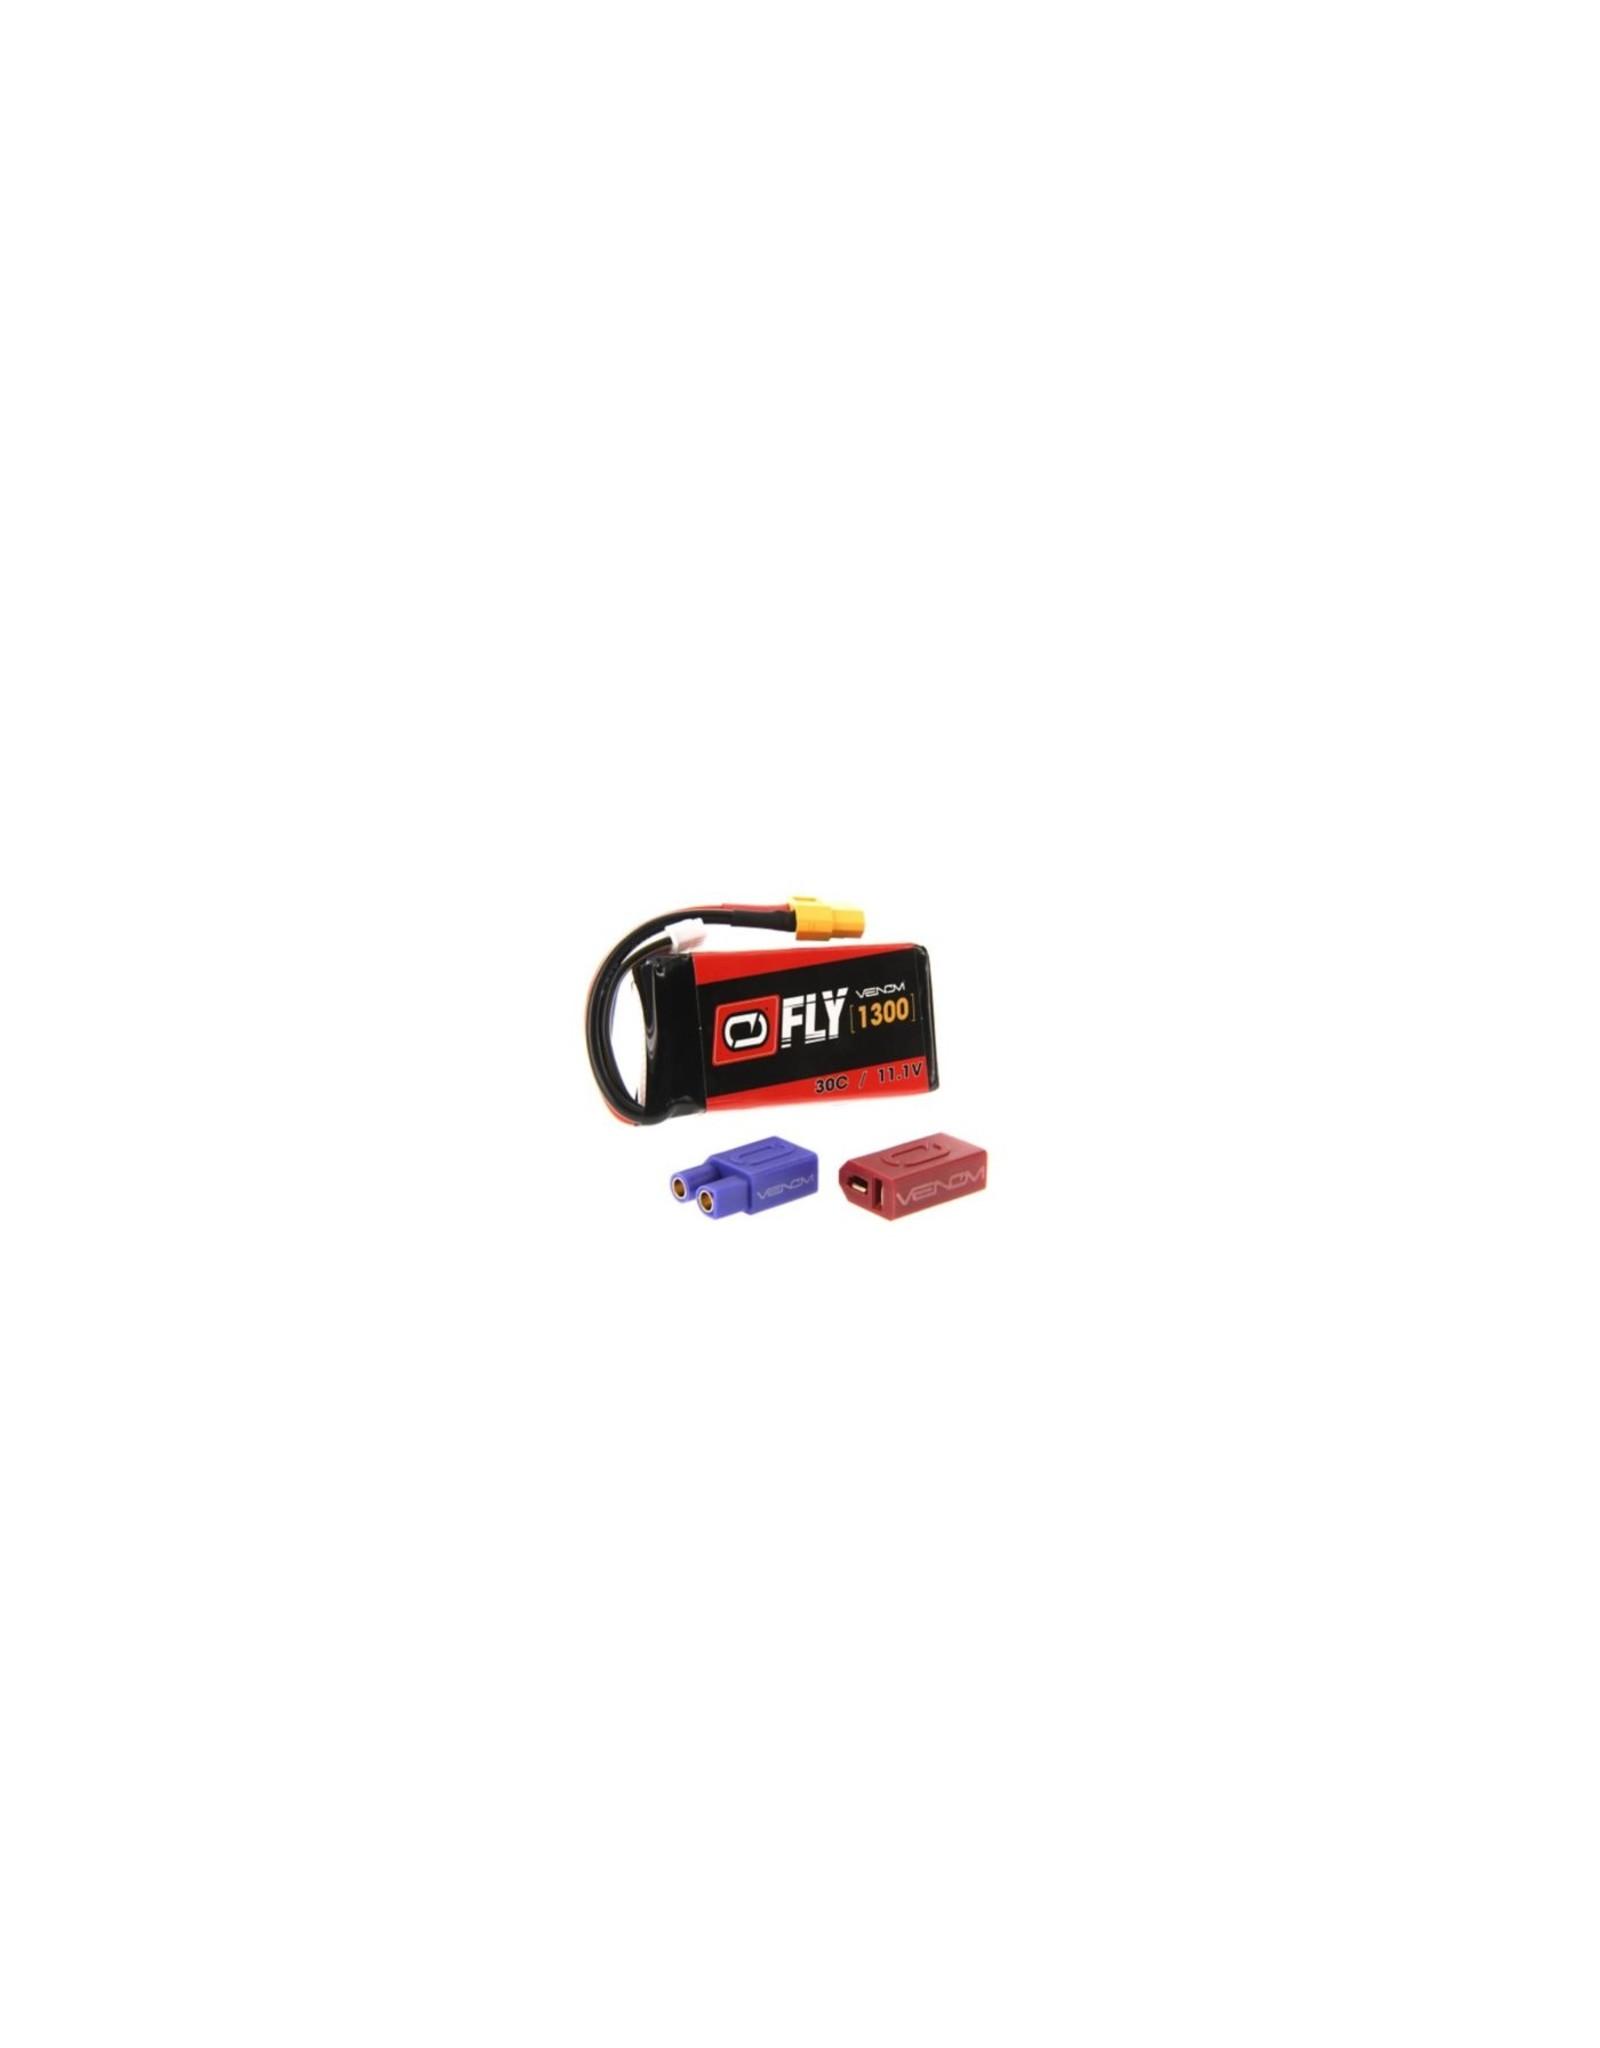 Venom Racing VNR25028 - 11.1V 1300mAh 3S 30C FLY LiPo Battery: UNI 2.0 Plug